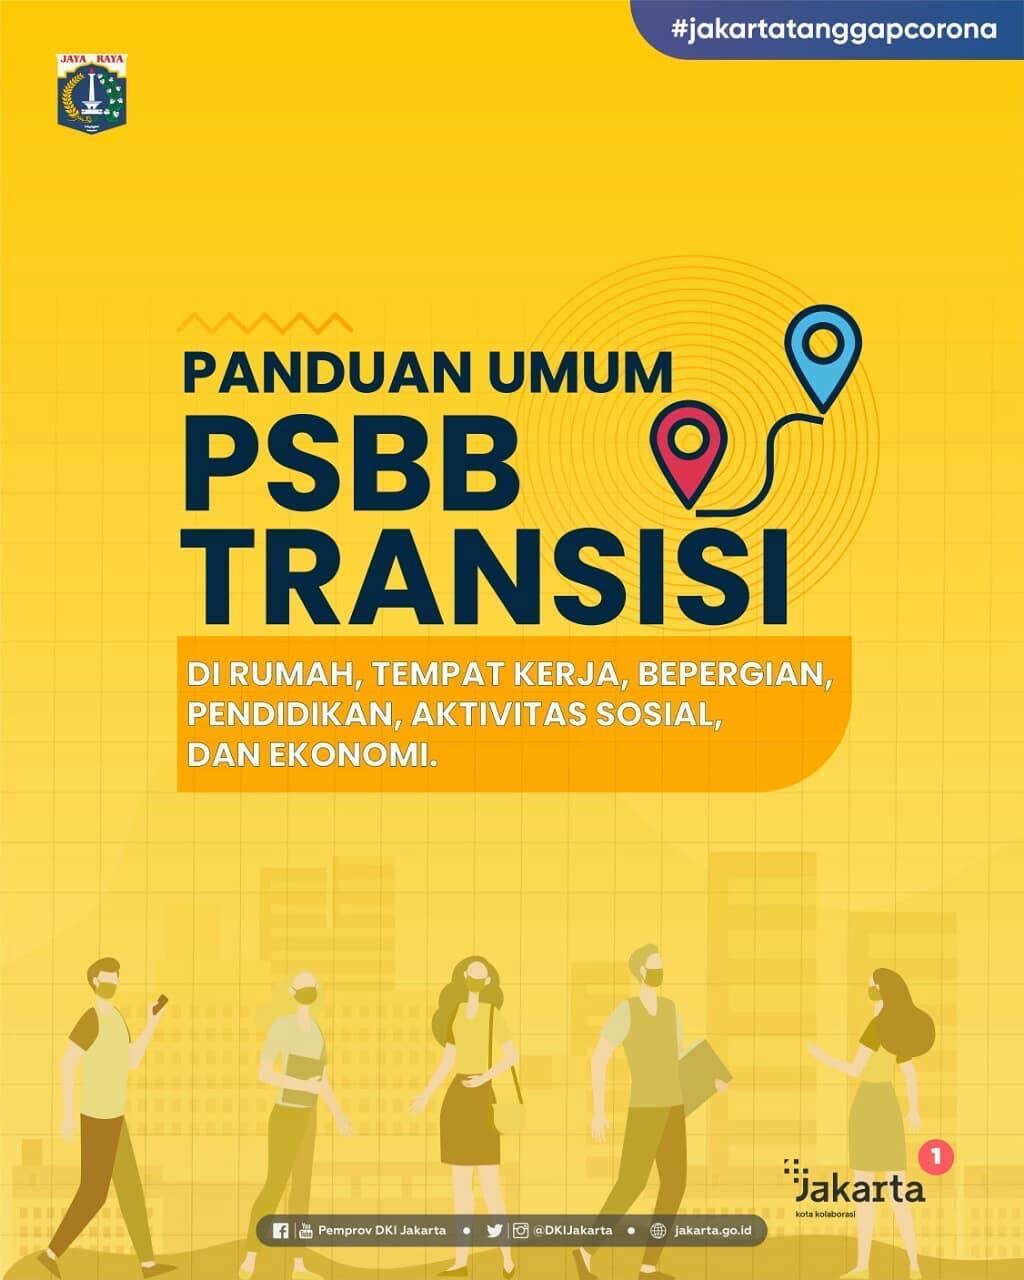 Panduan Umum PSBB Transisi_Slide-1